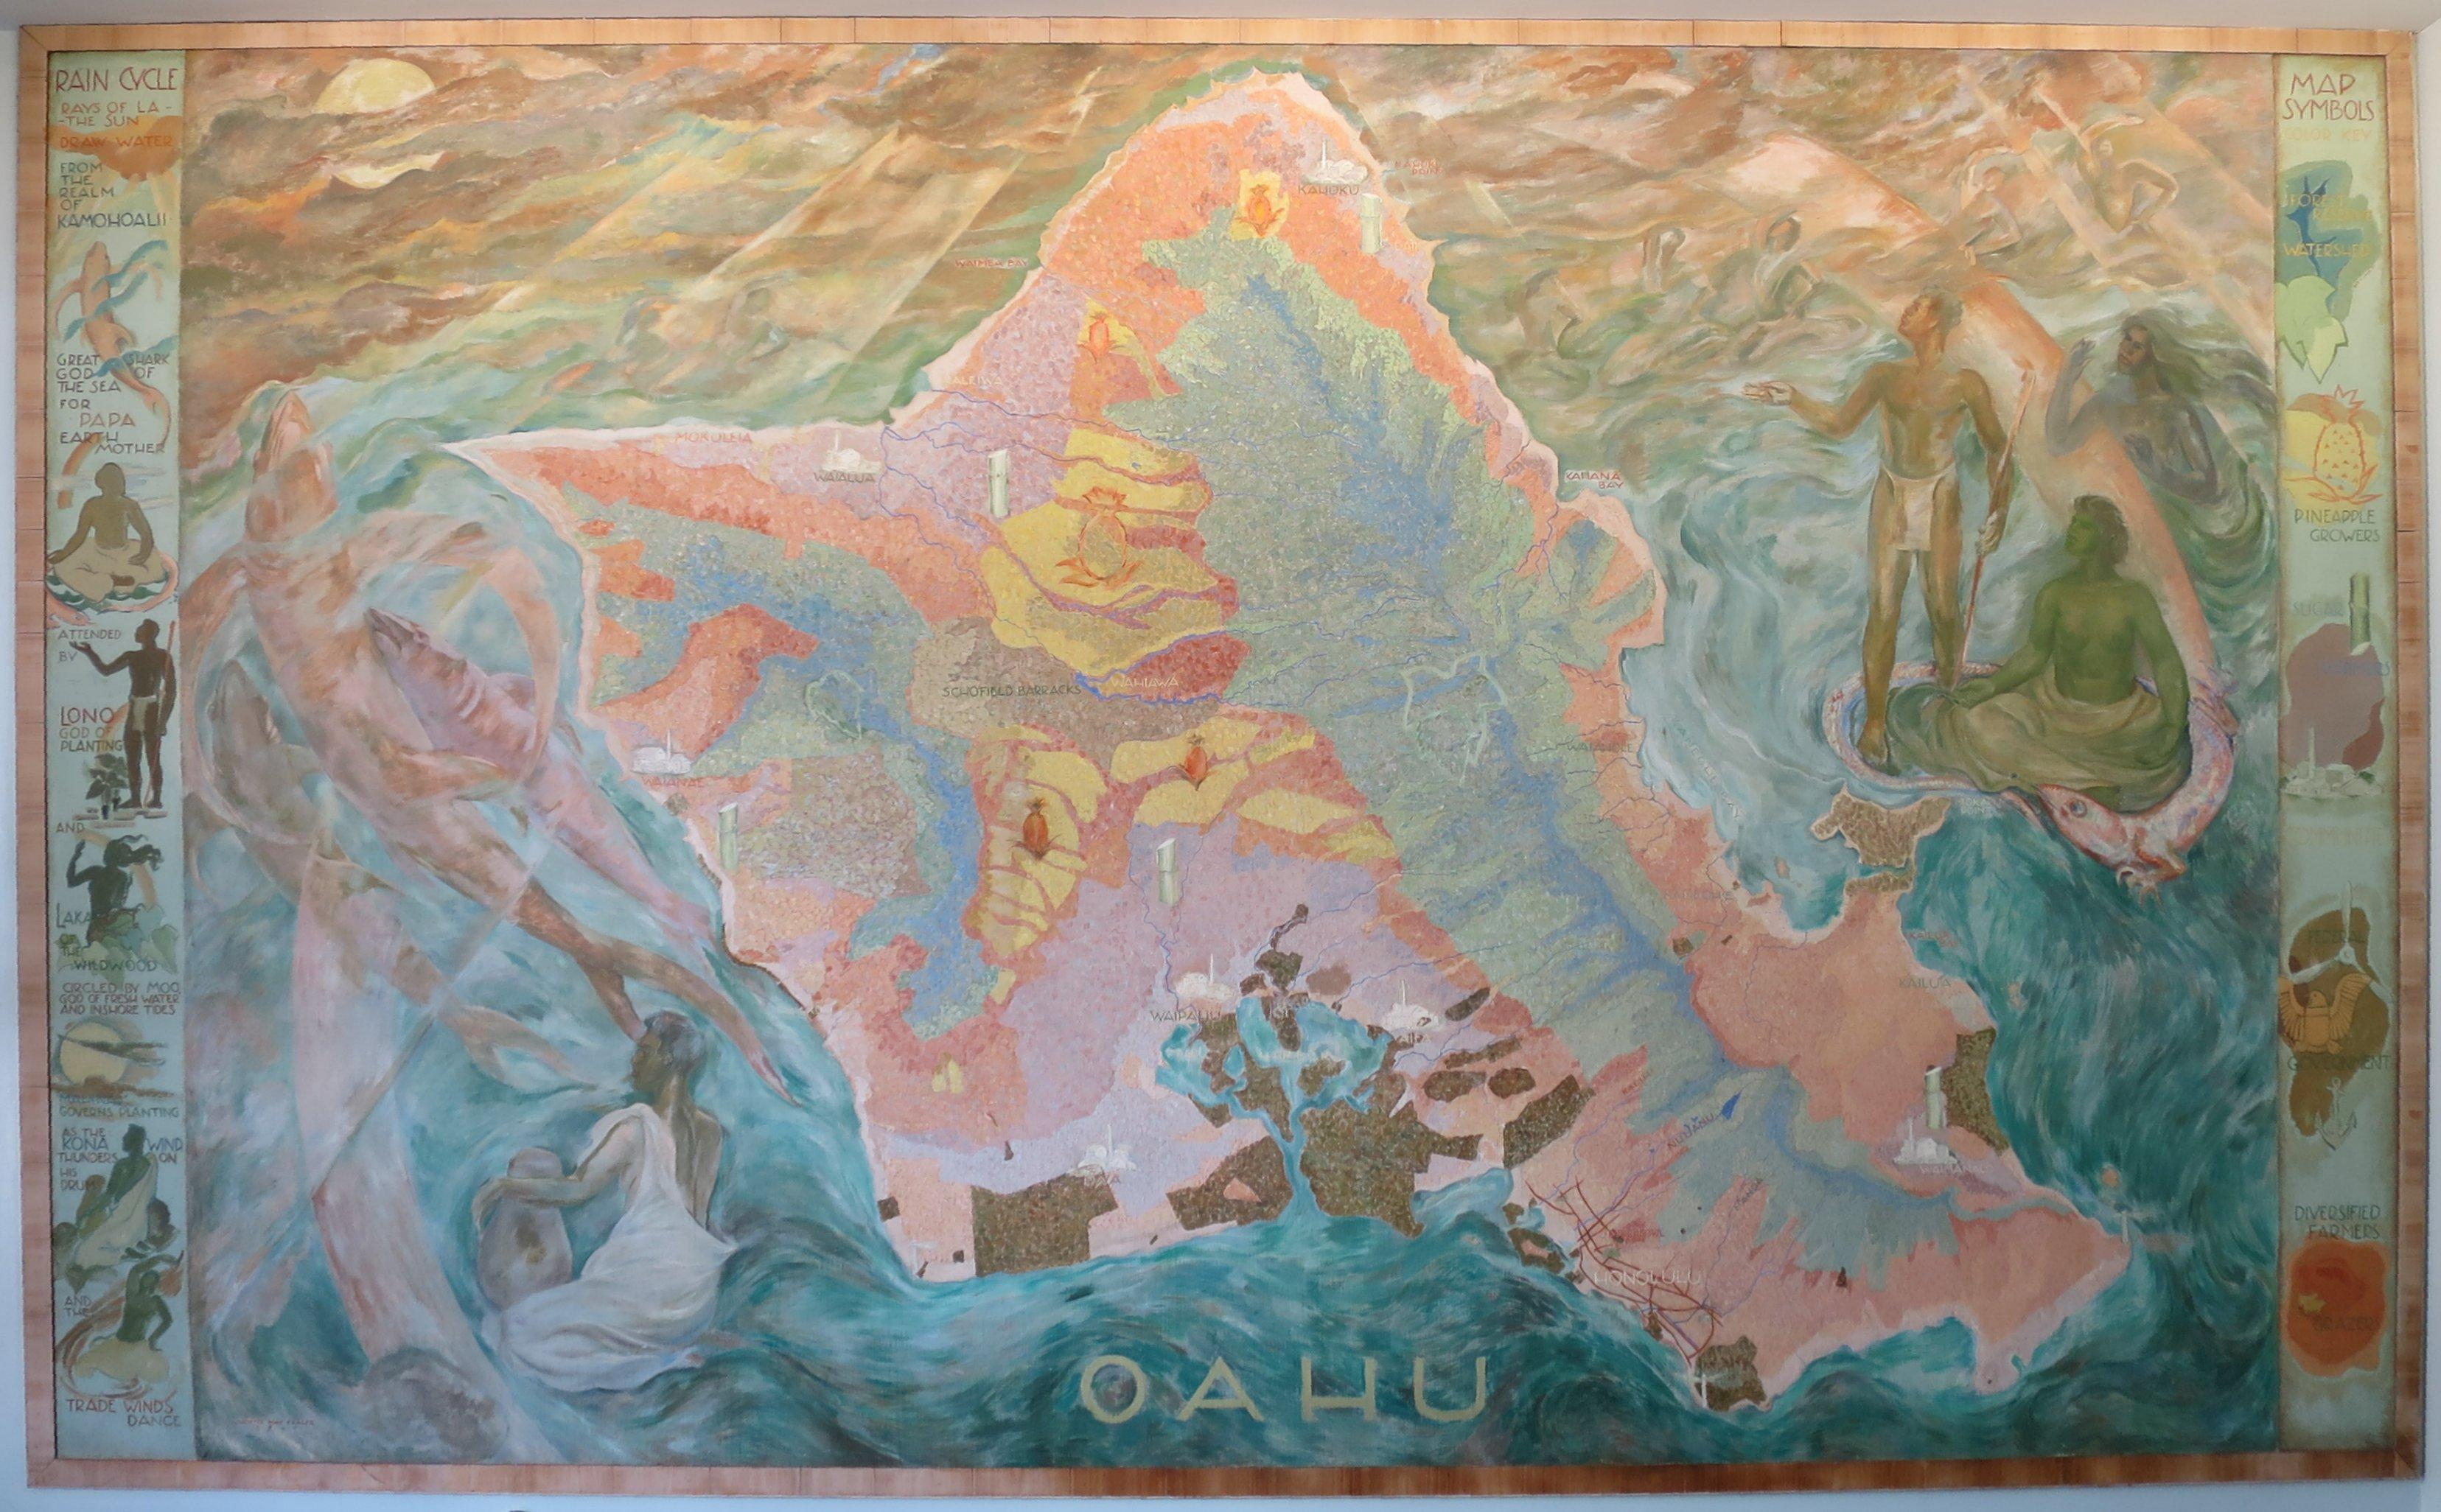 File:Oahu Mural by Juliette May Fraser, 1940, lobby